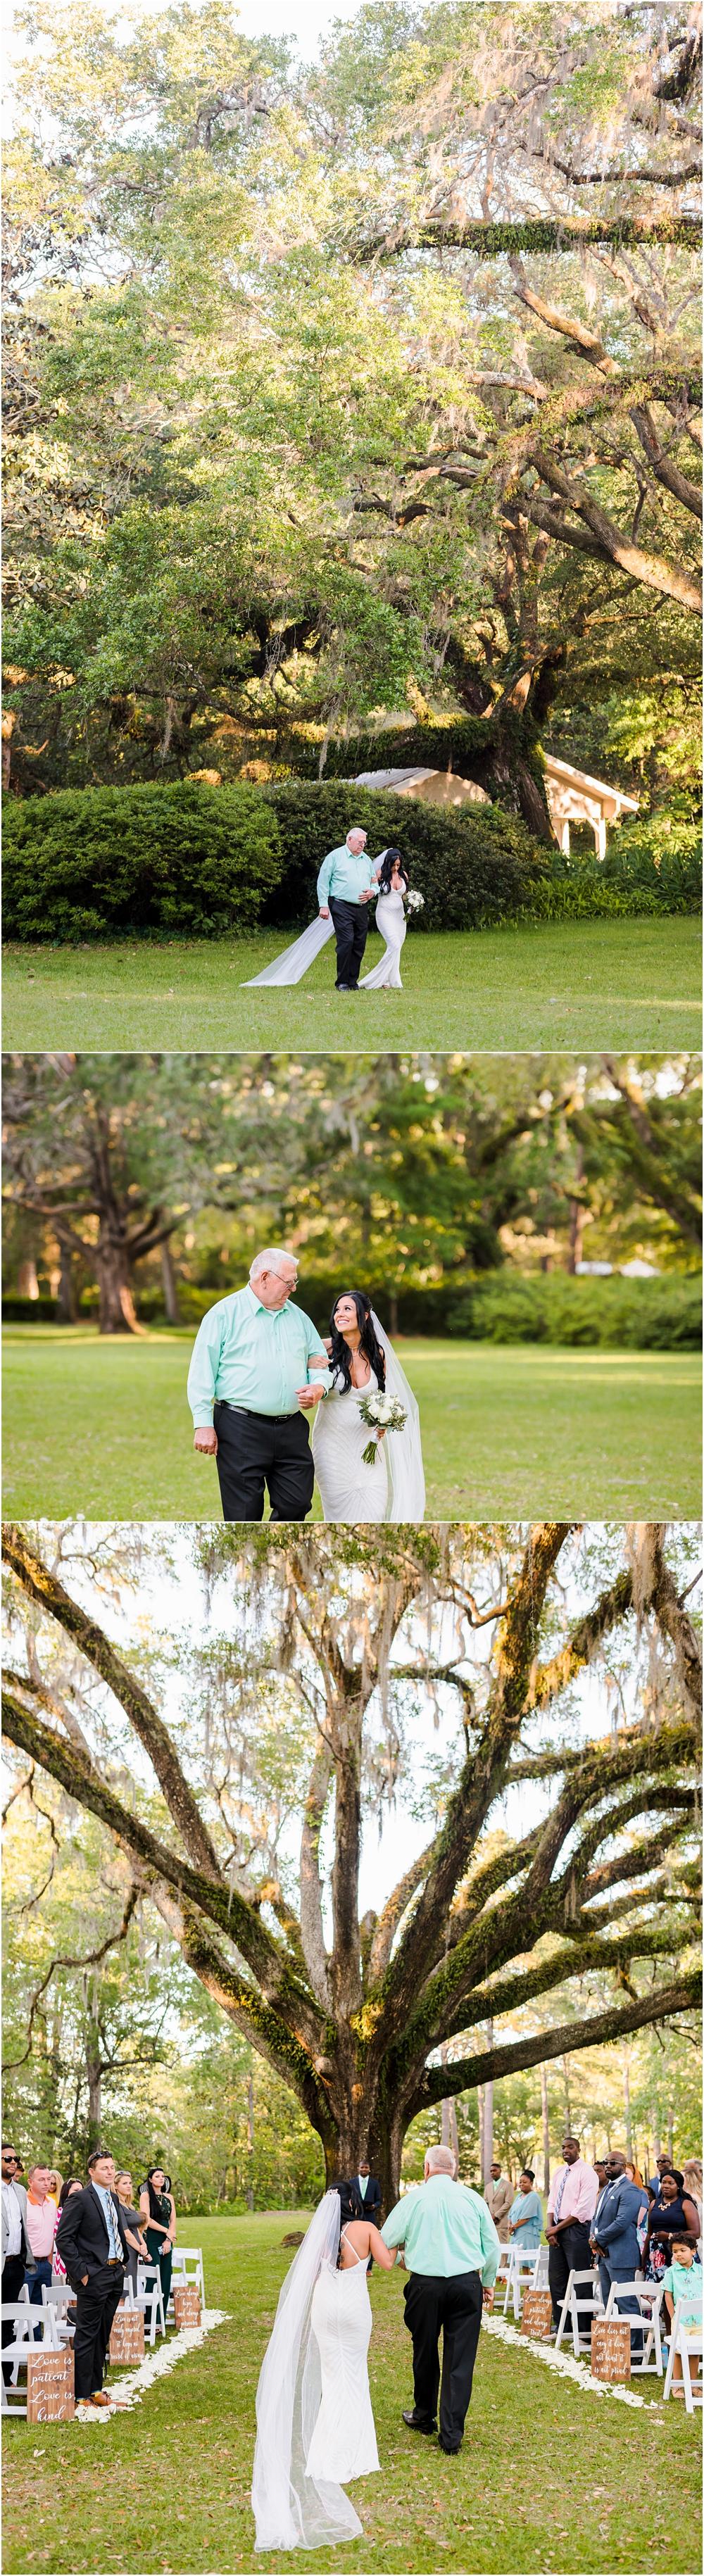 green-eden-gardens-florida-wedding-kiersten-stevenson-photography227.jpg